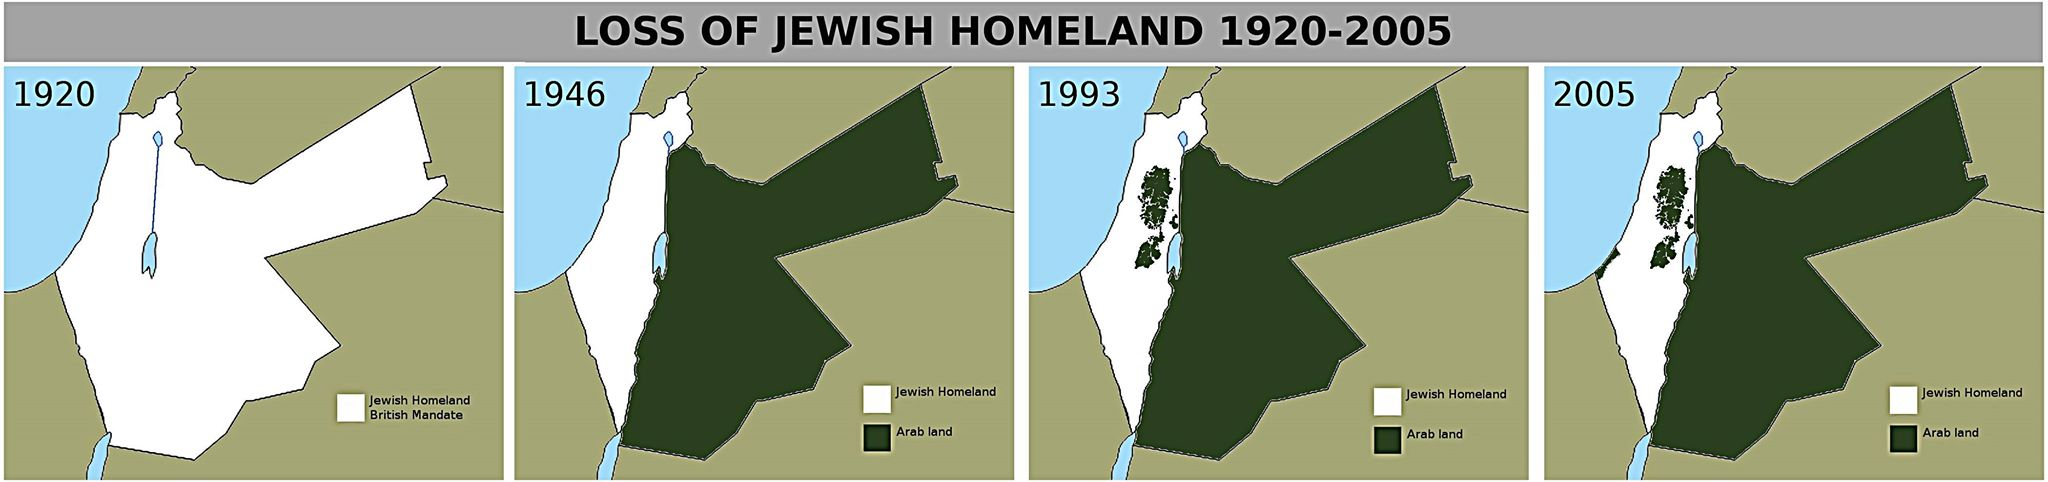 loss of jewish homeland